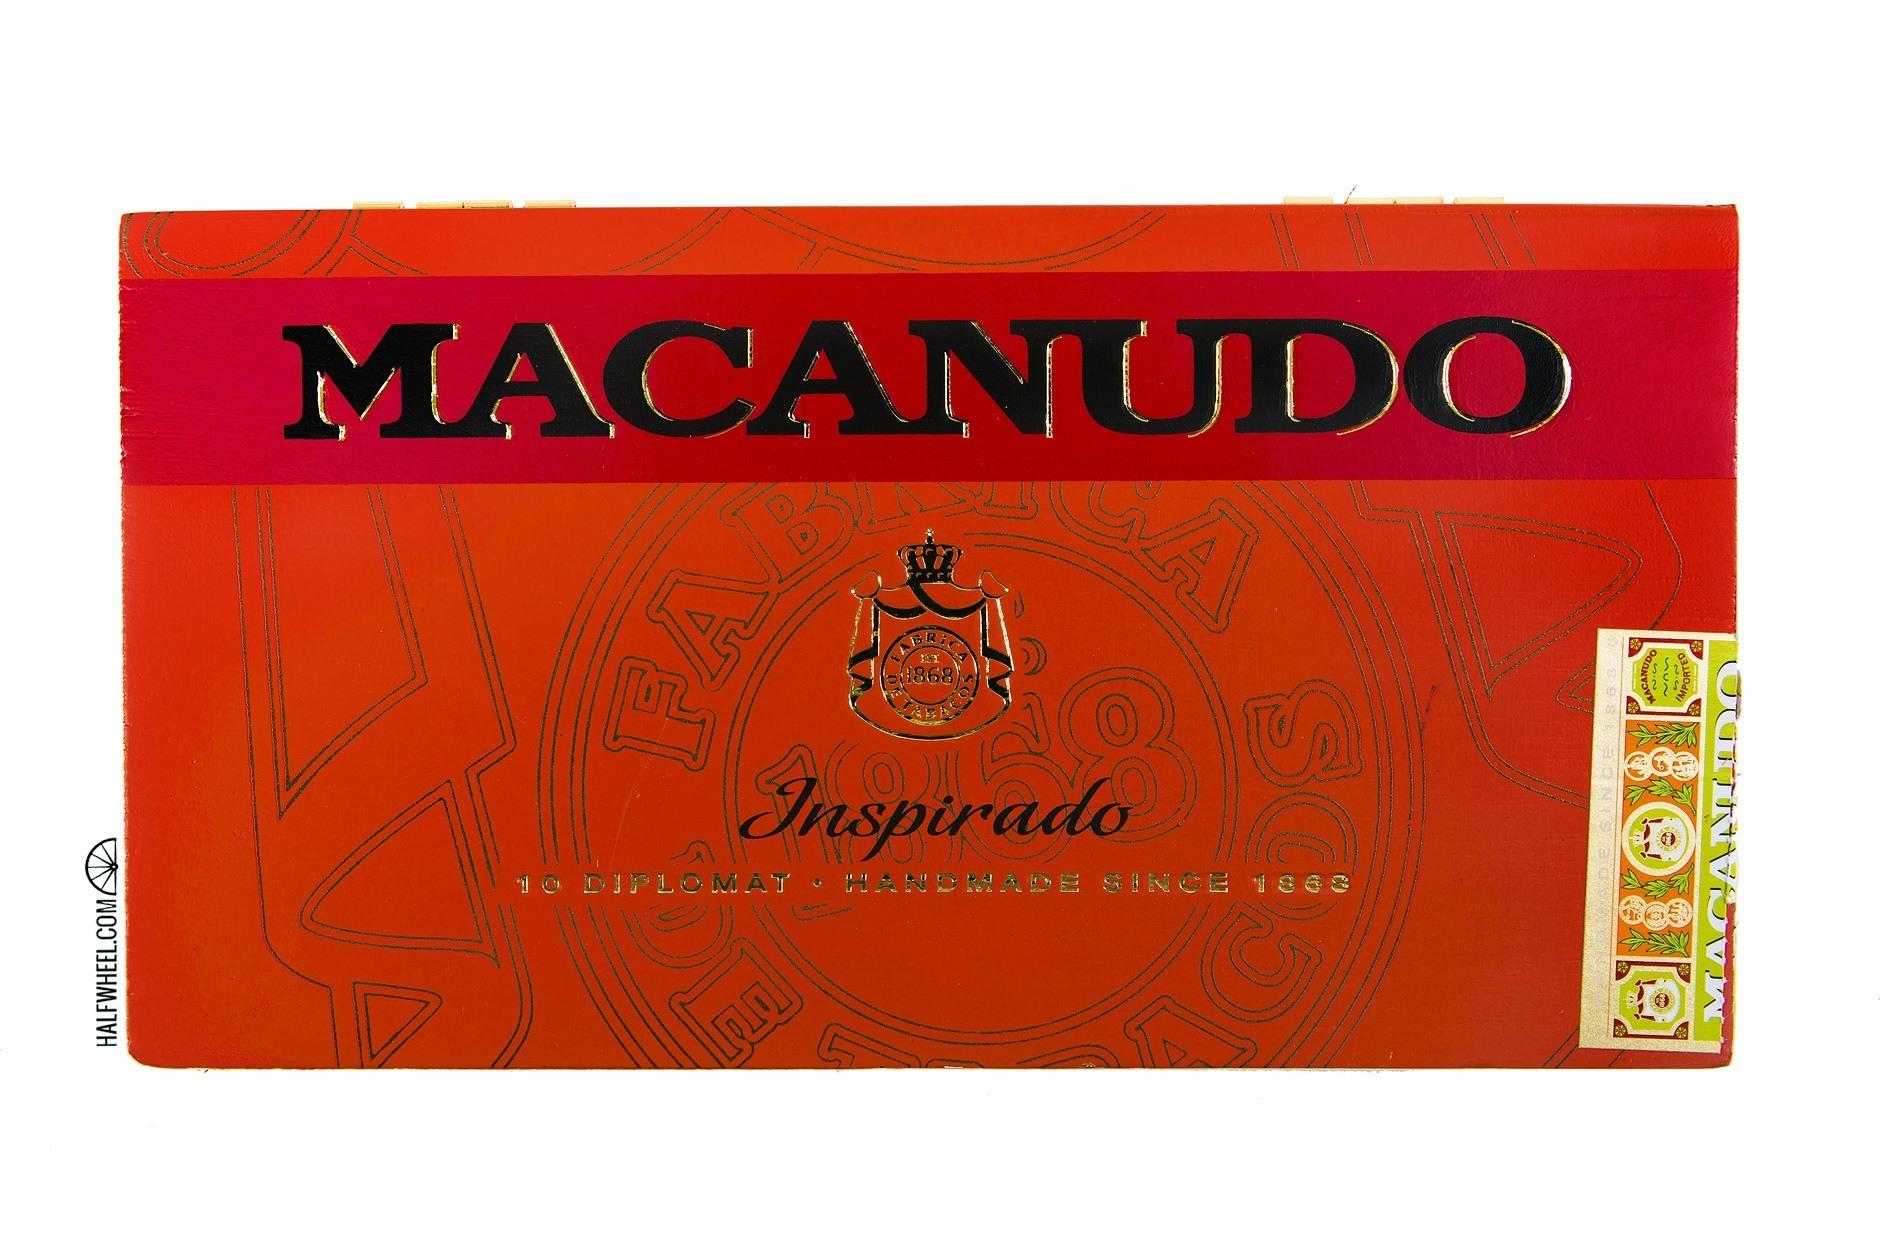 Macanudo Inspirado Diplomat Box 1